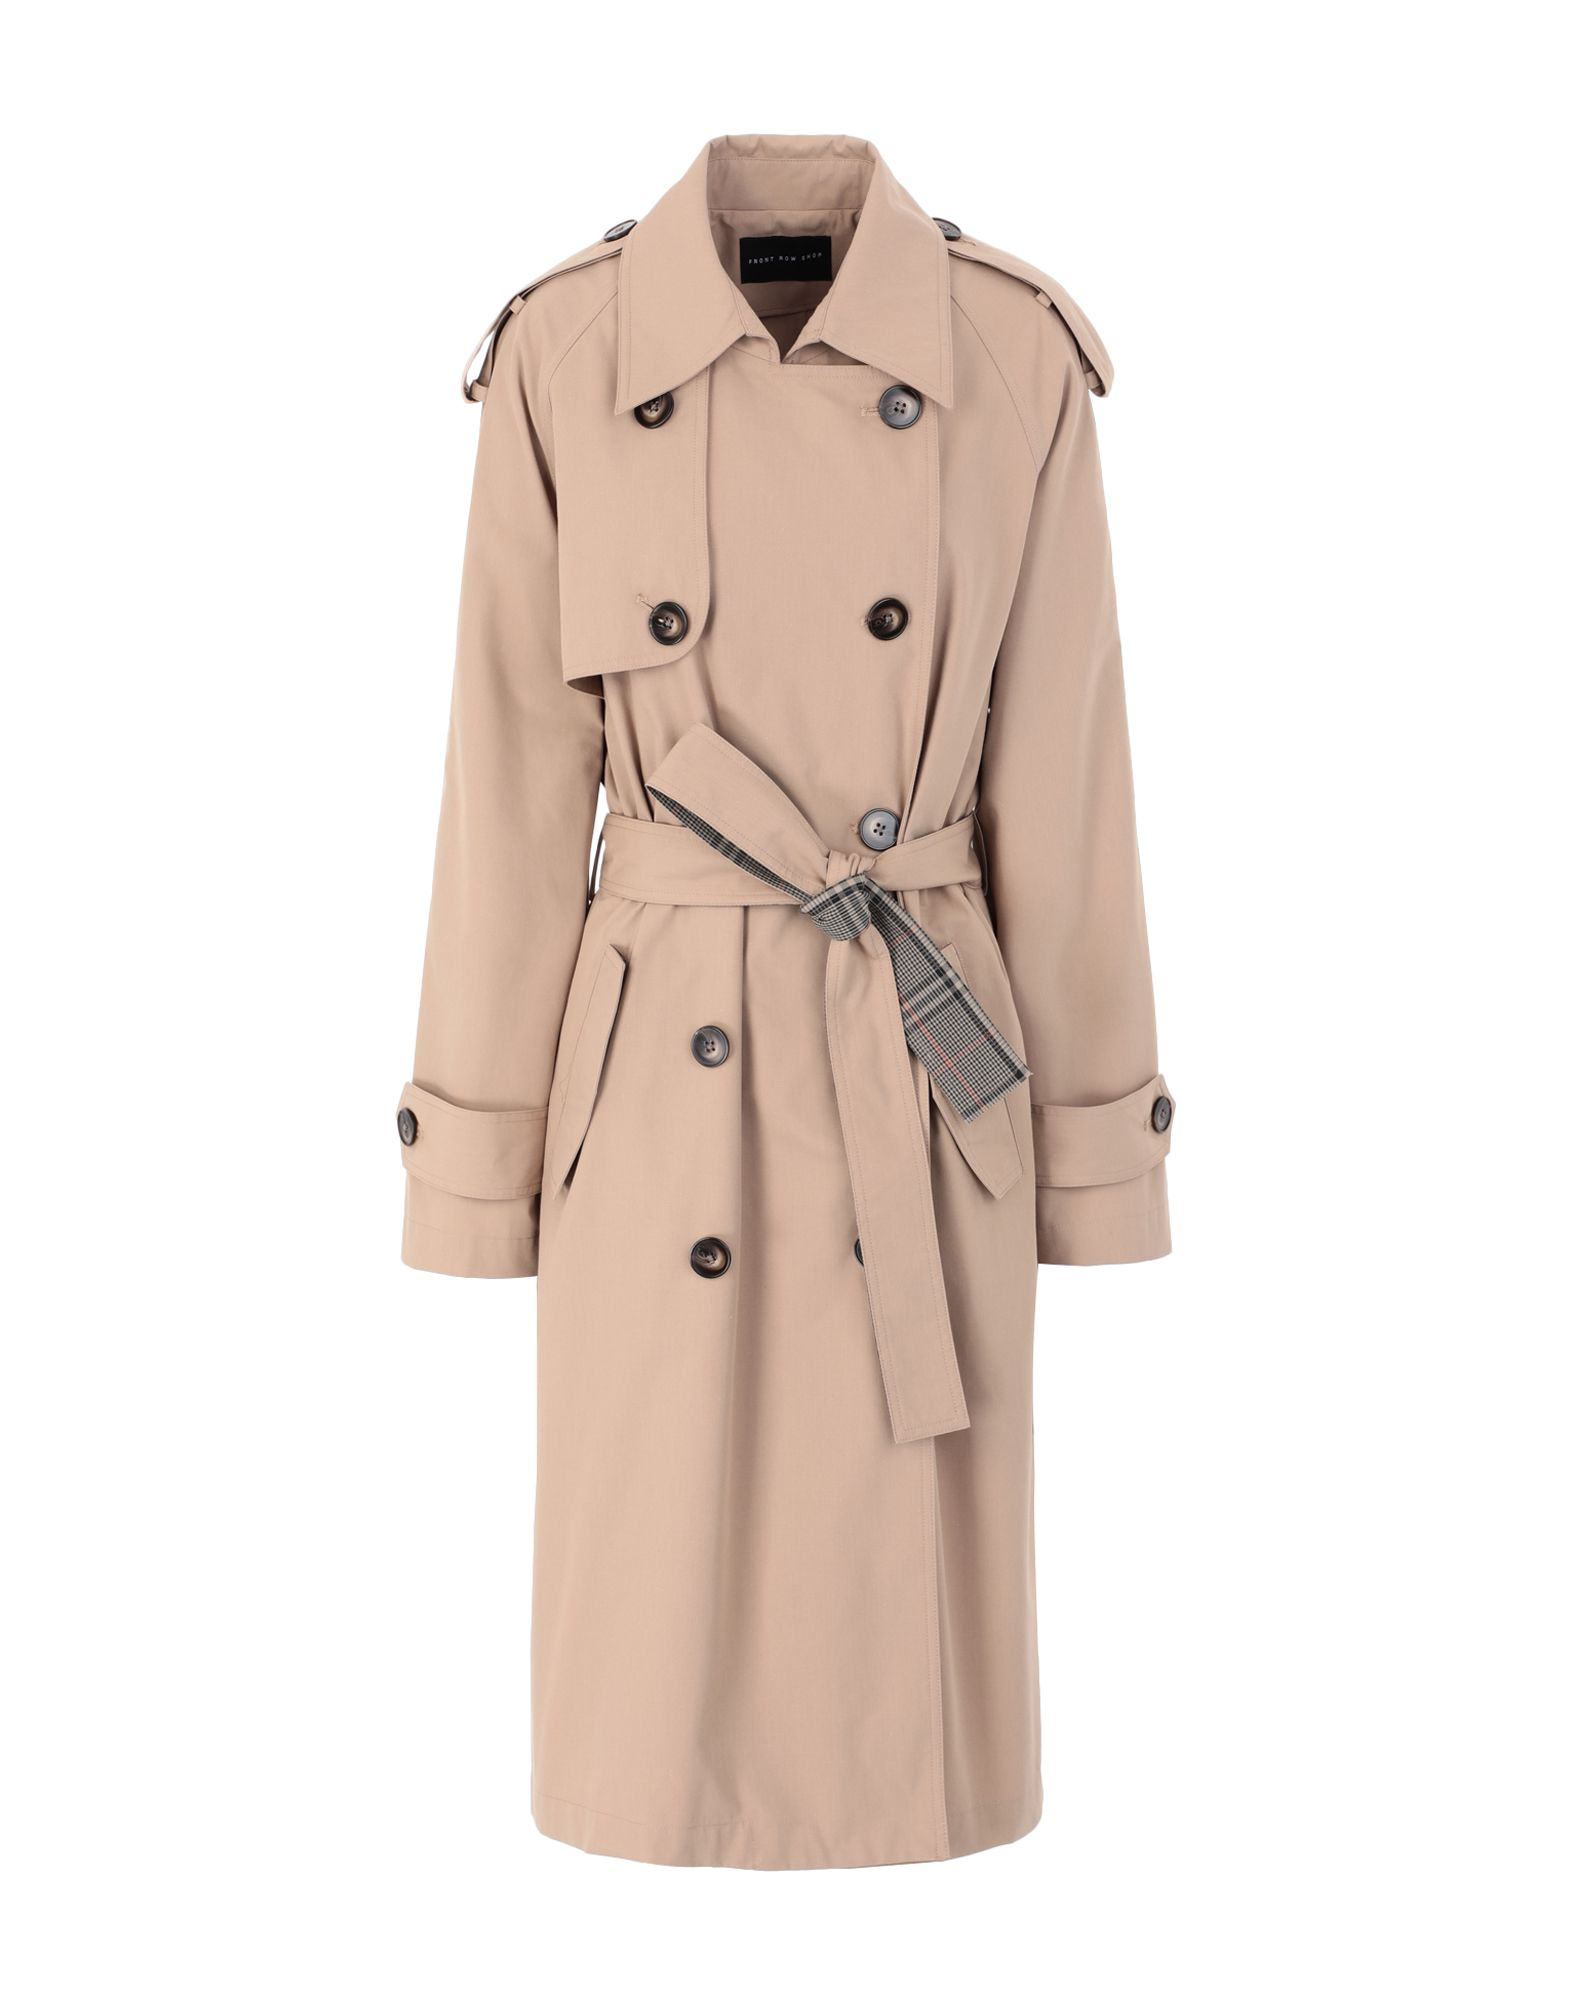 Фото - FRONT ROW SHOP Легкое пальто the row легкое пальто